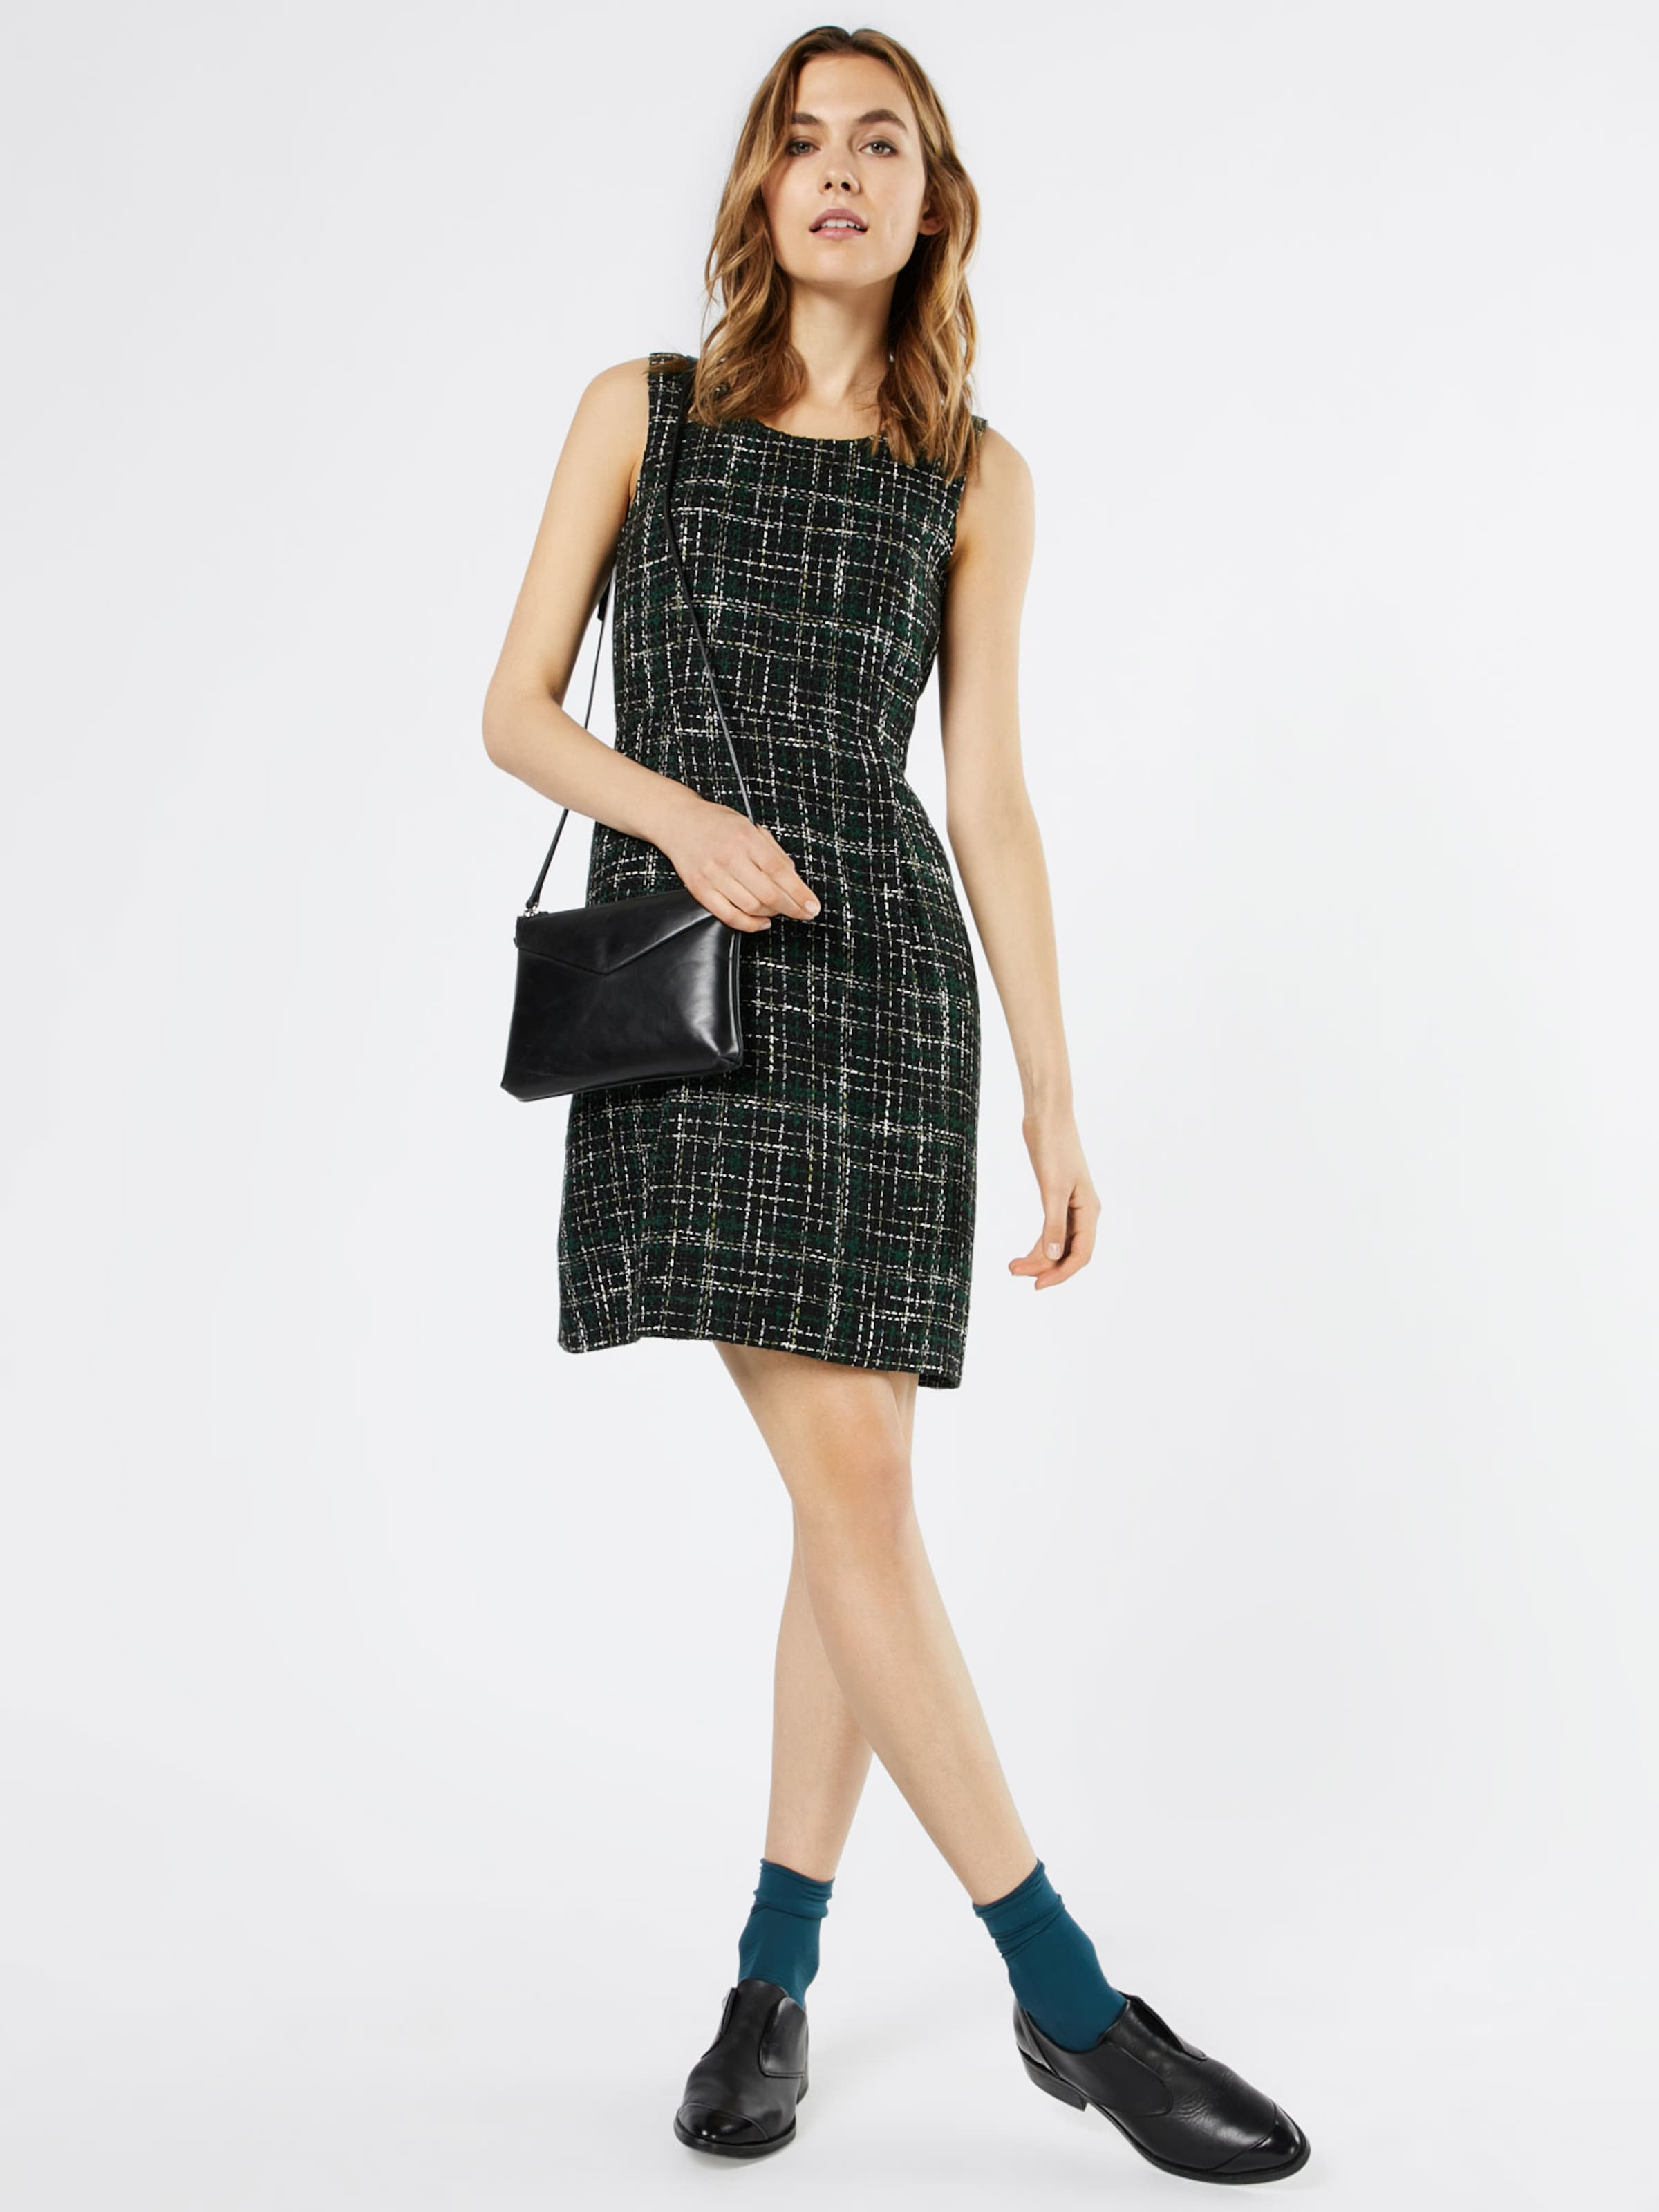 MORE & MORE Bouclé-Kleid Bester Speicher Billig Online Zu Bekommen QrsdO6IJ